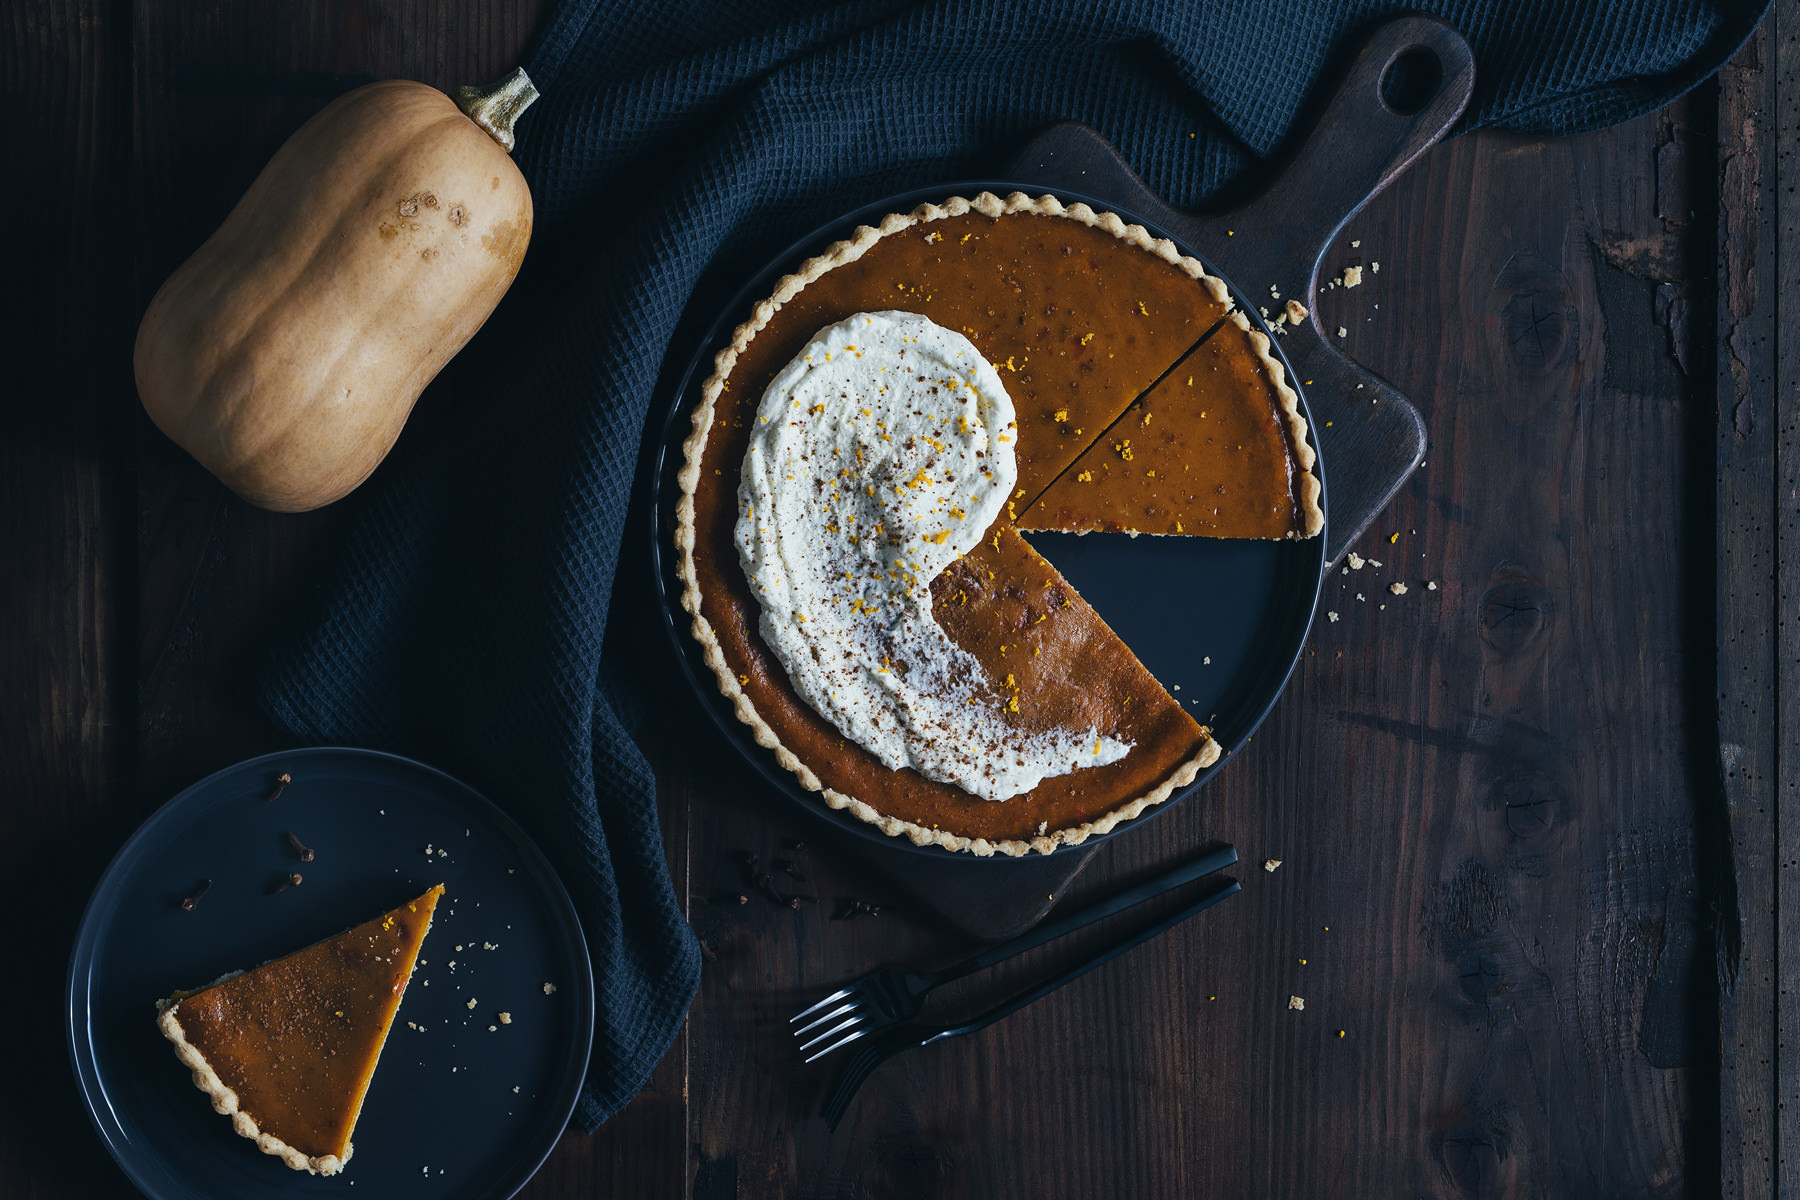 https://lauramorgenstern.de/wp-content/uploads/2018/11/laura-morgenstern_pumpkin-pie.jpg